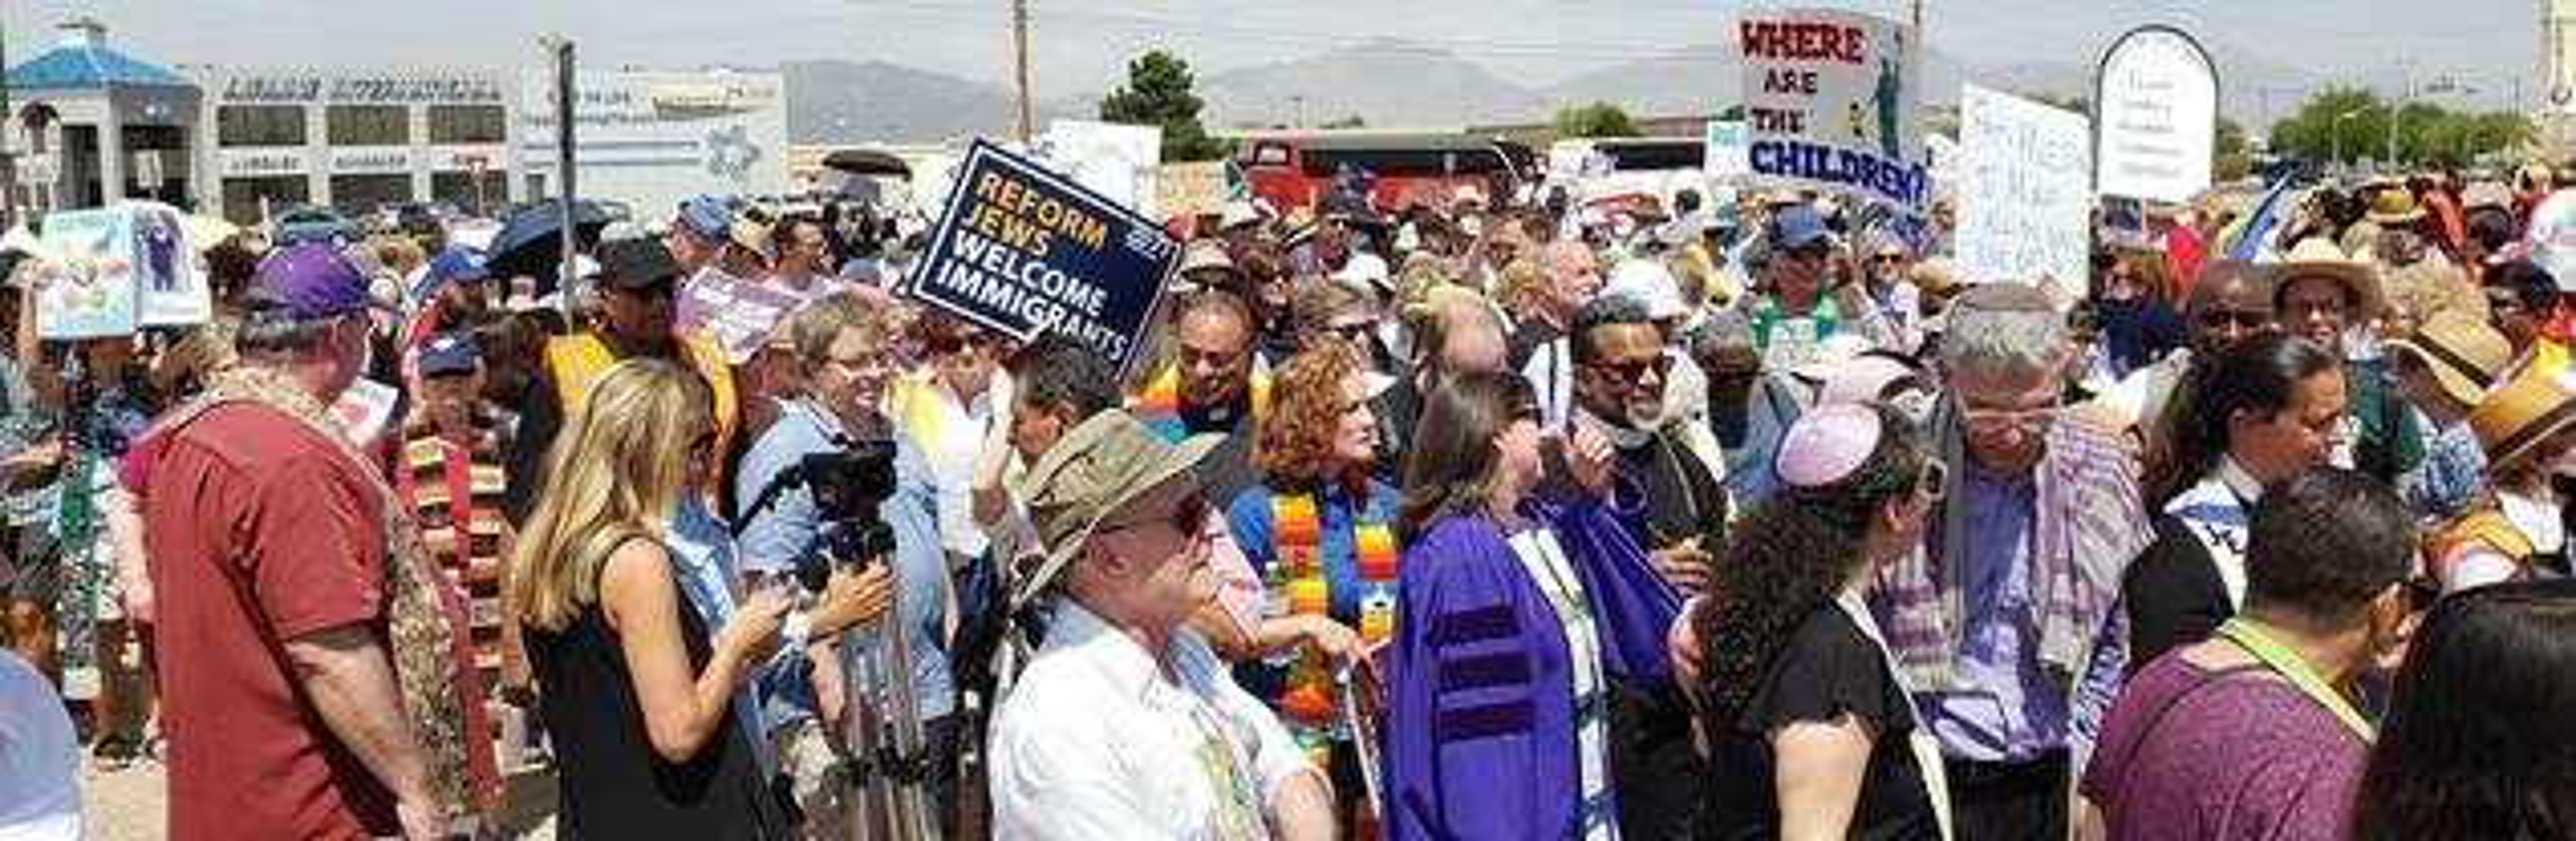 Moral Monday Demonstration at El Paso detention center